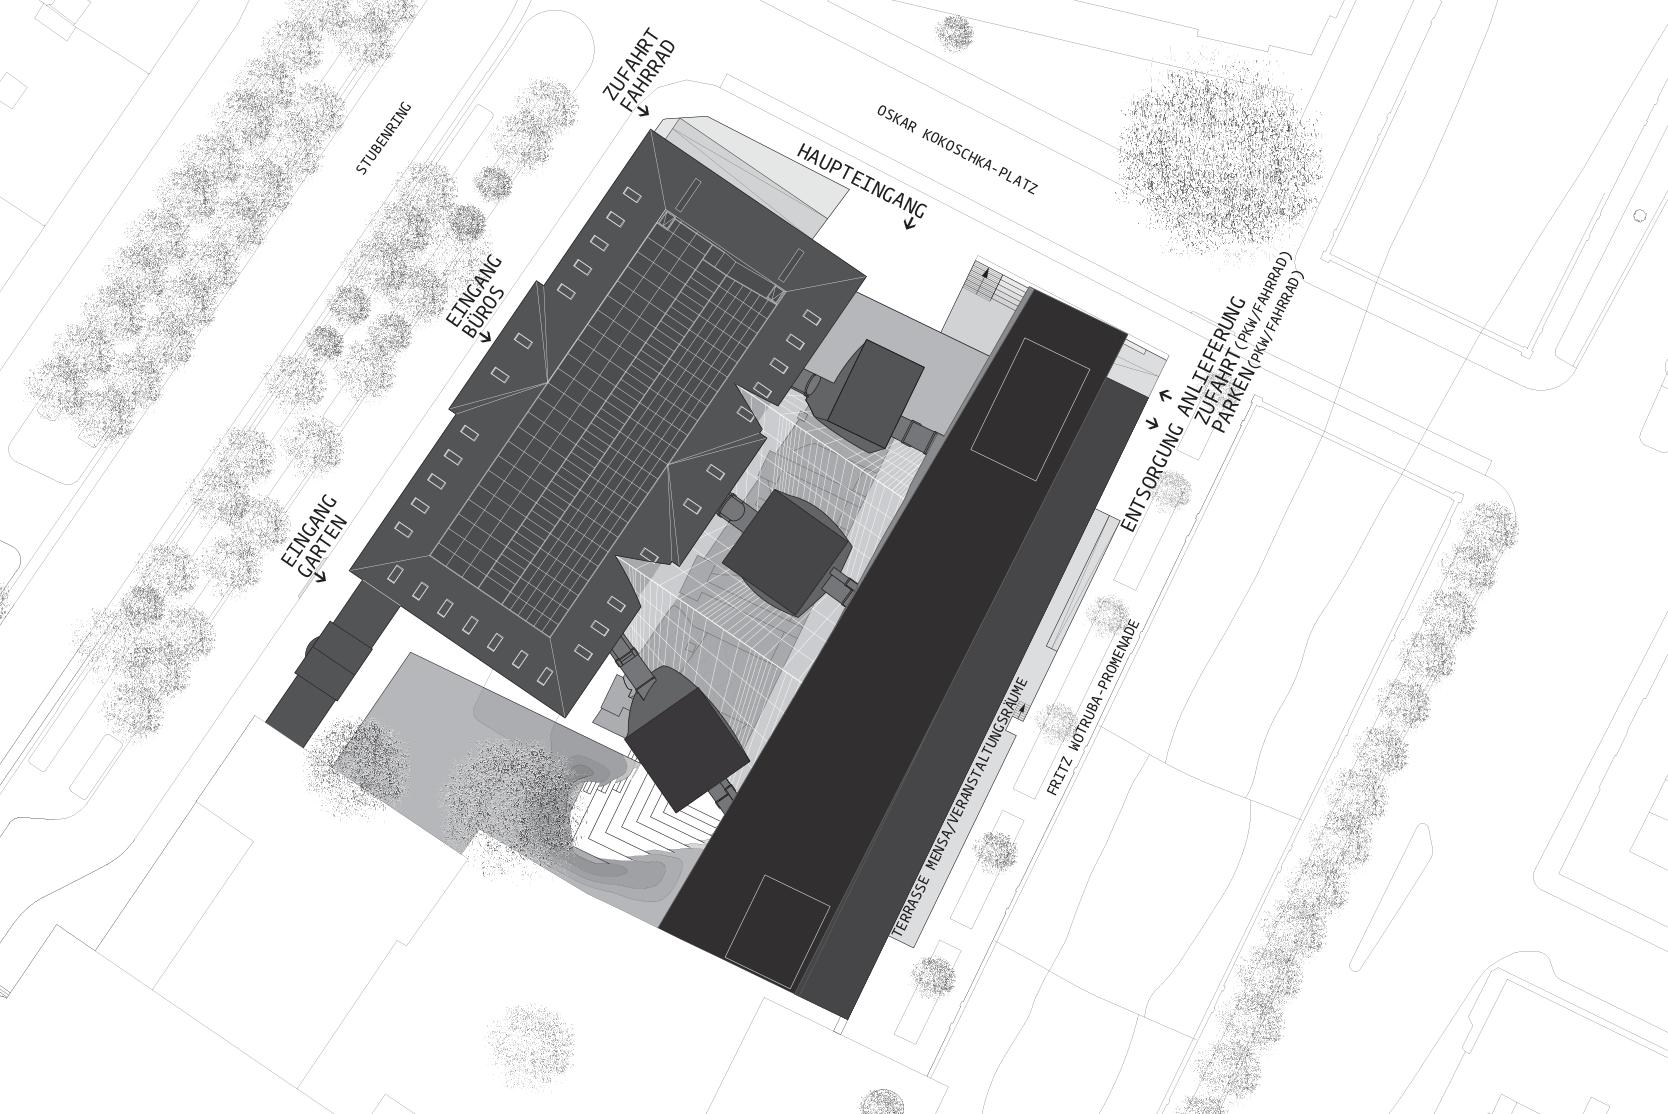 Angewandte Wien: Site plan